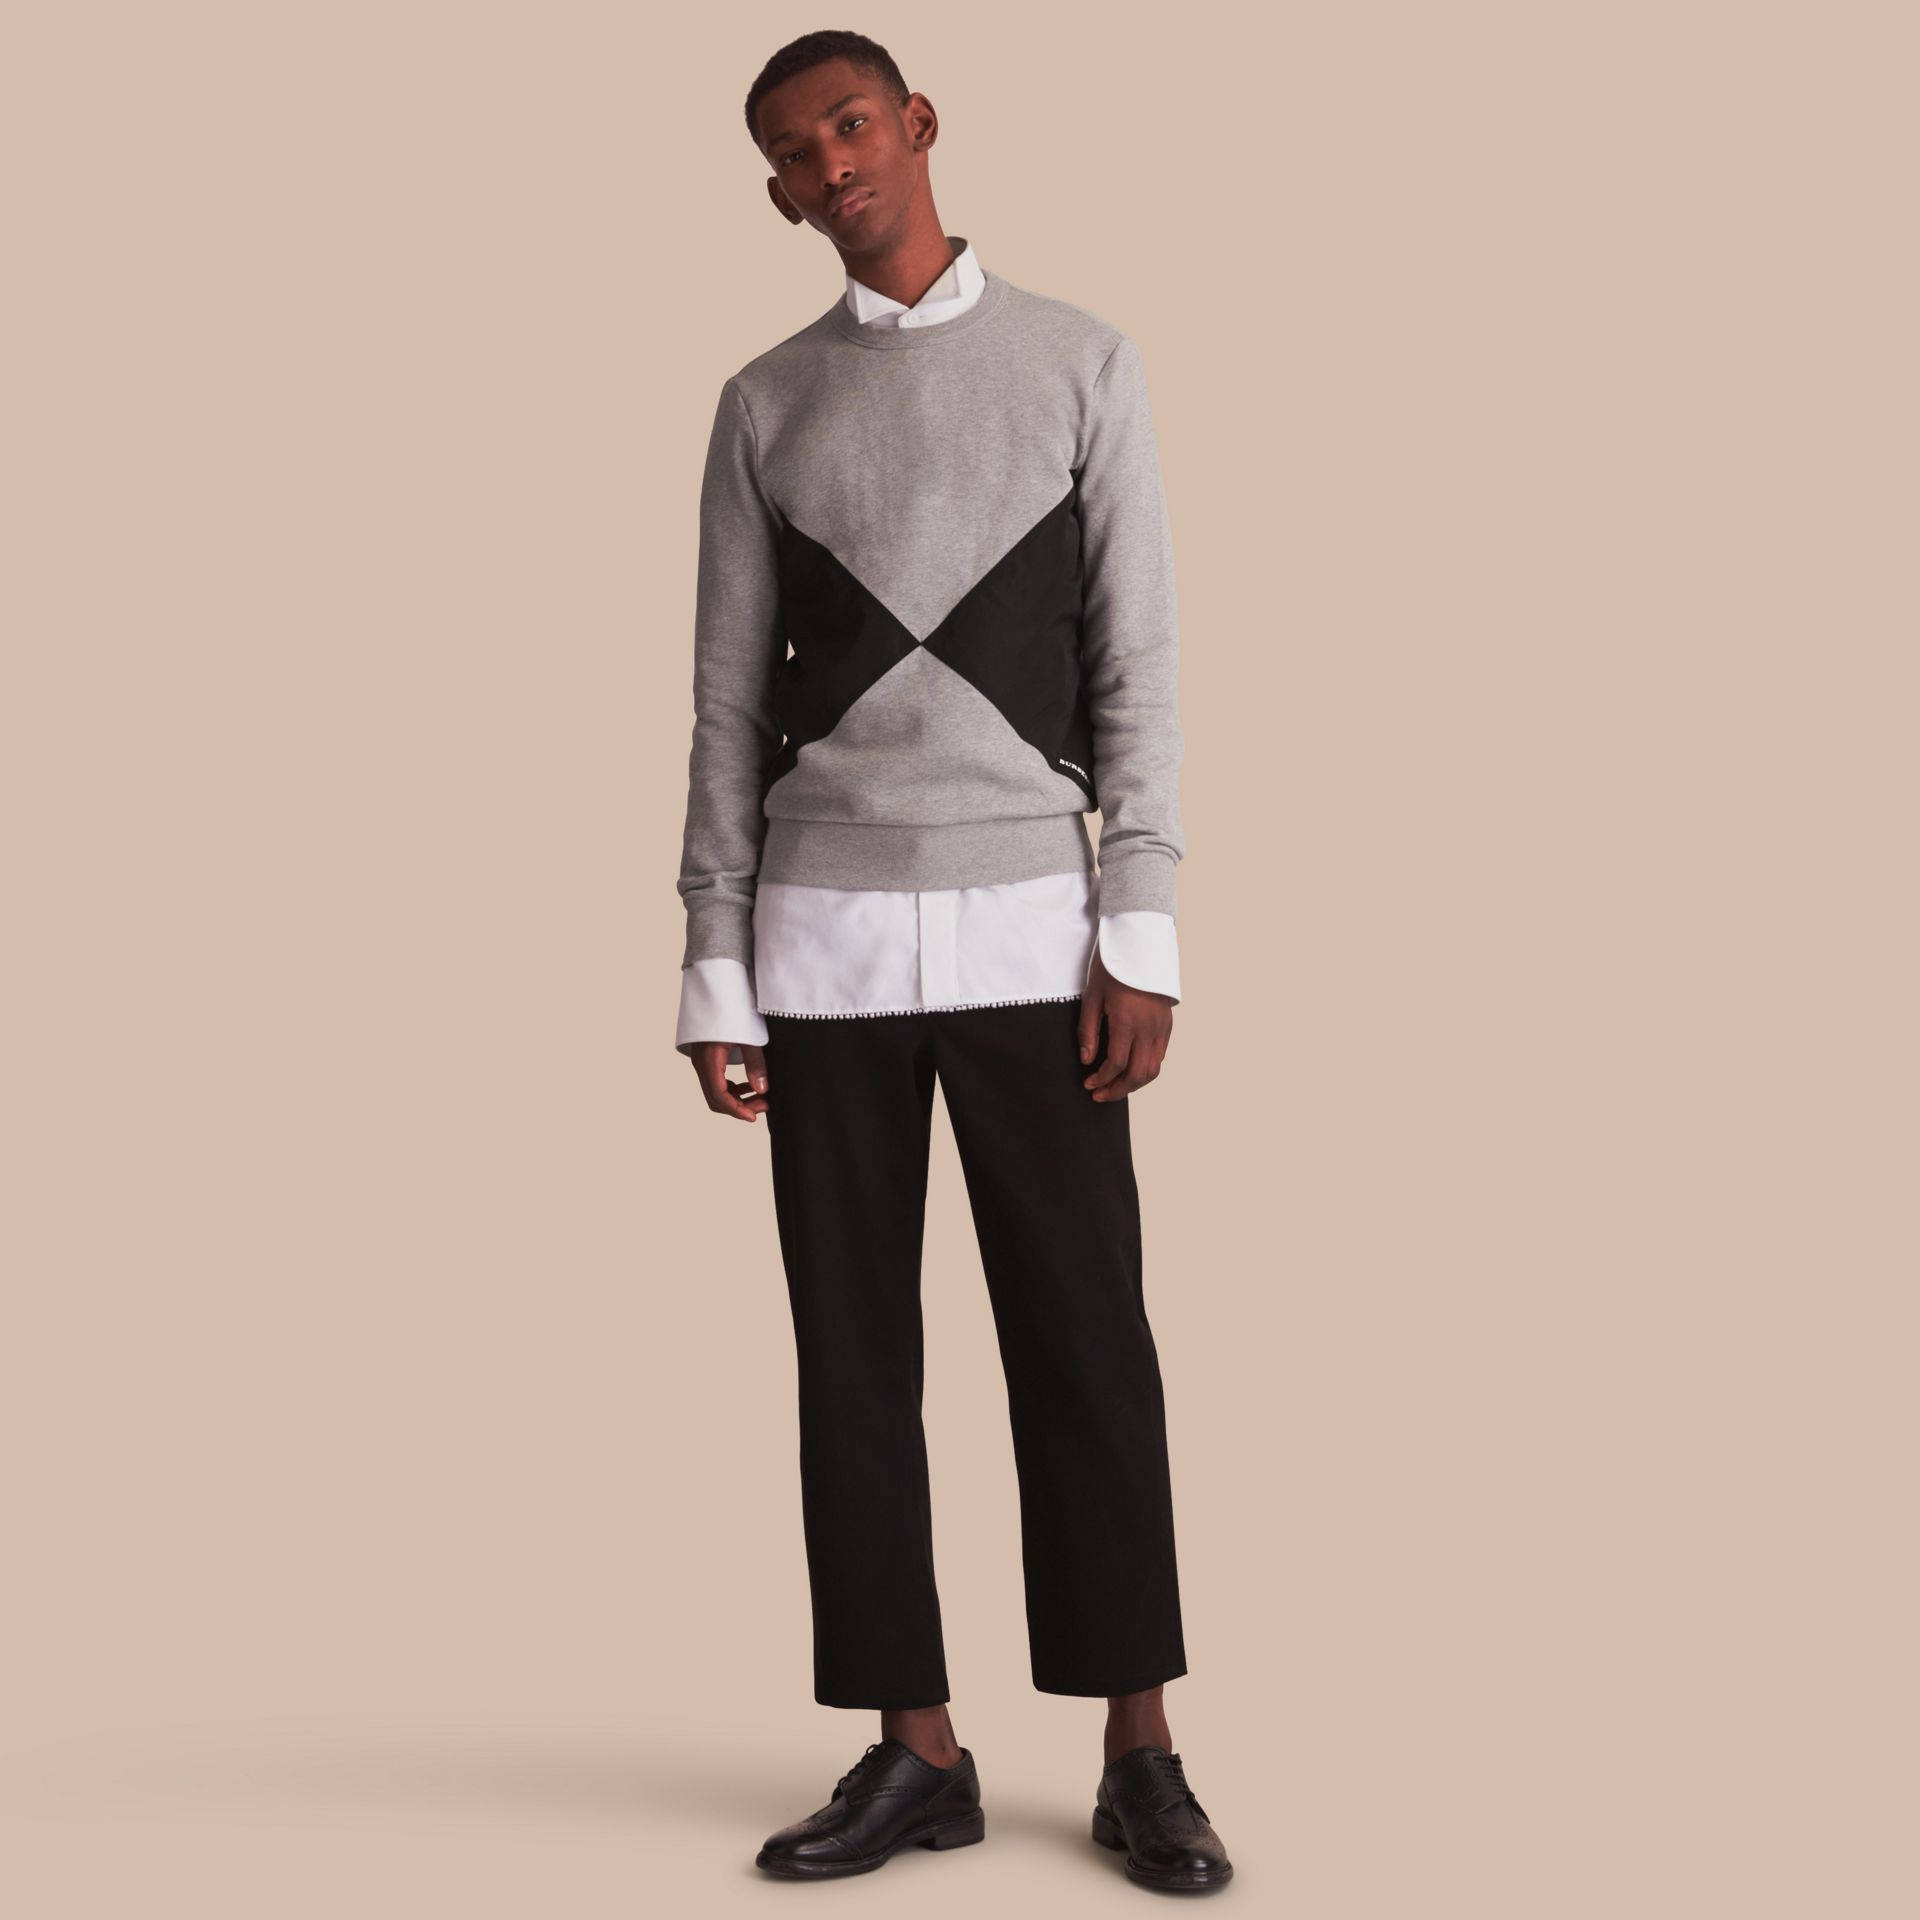 Overlaid Geometric Motif Sweatshirt - gallery image 1